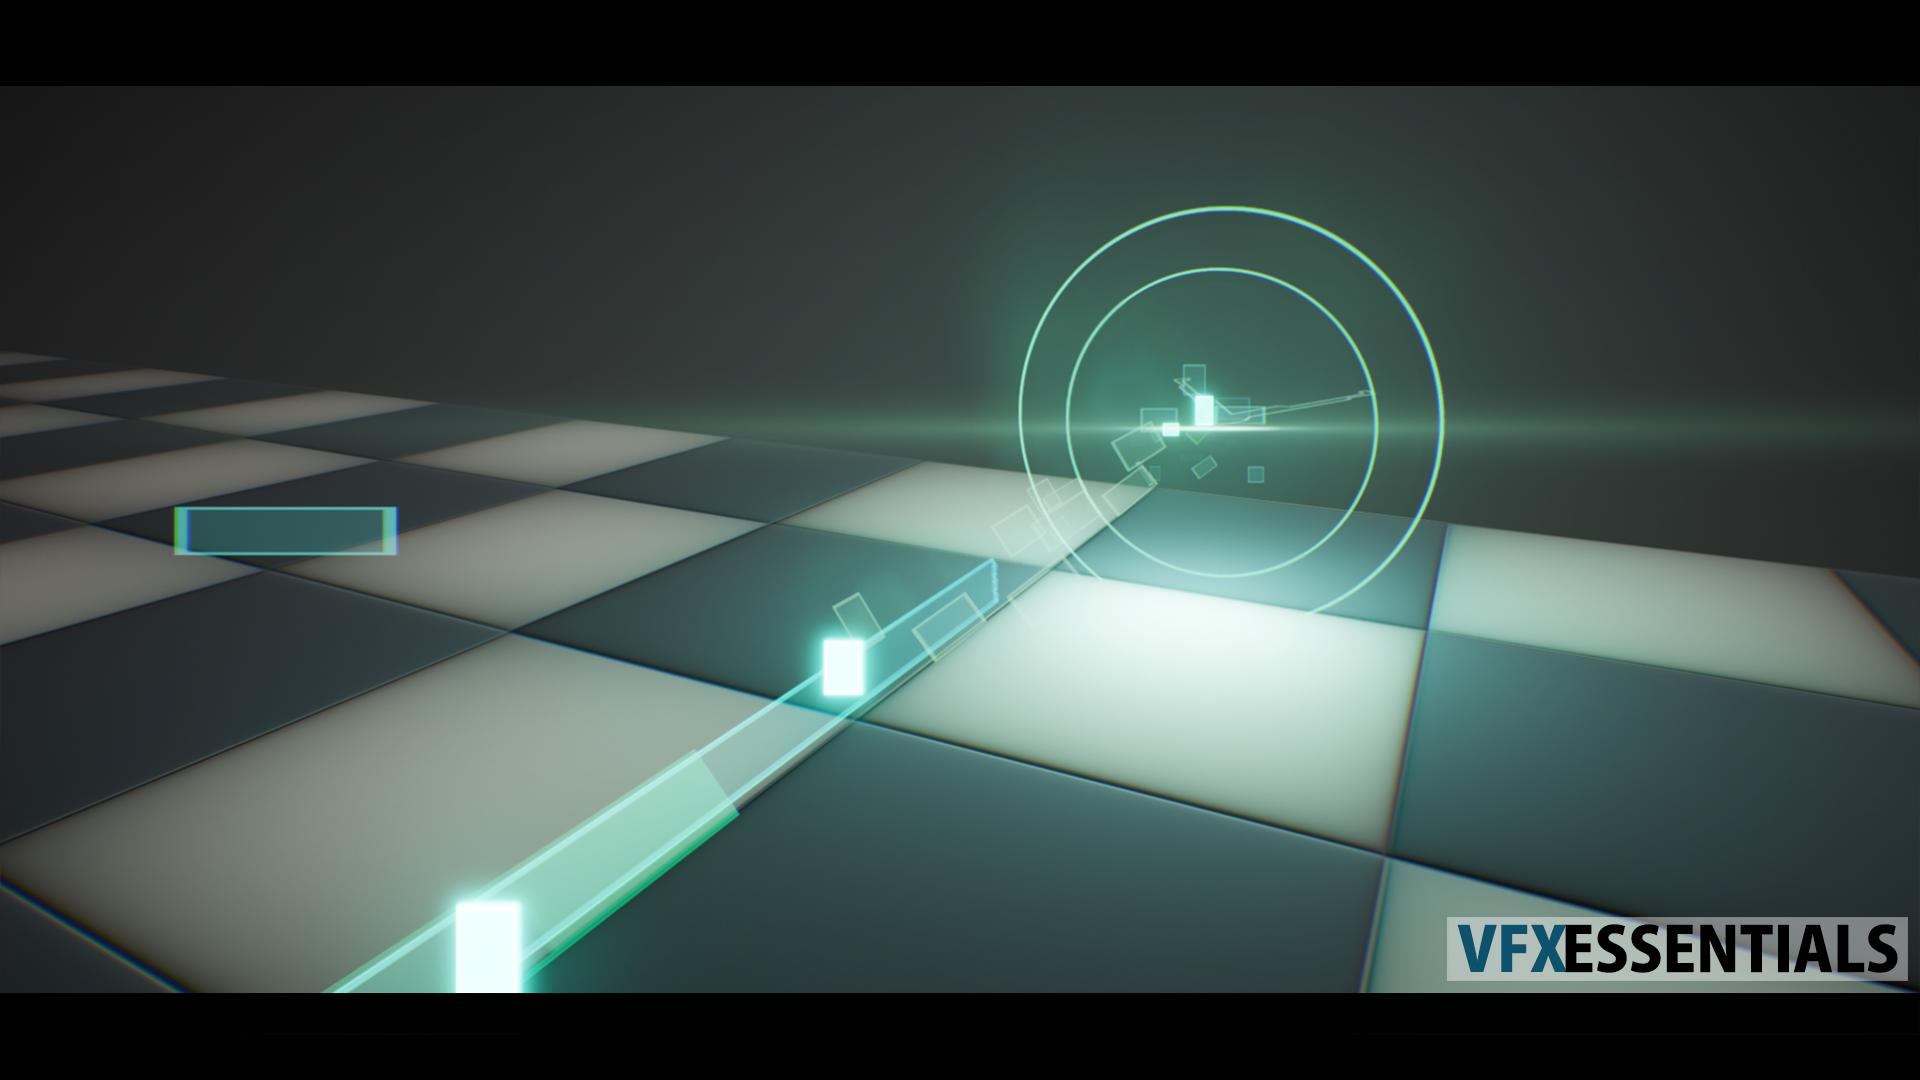 VFX Essentials : Arrows v1 by Niels Dewitte in Visual